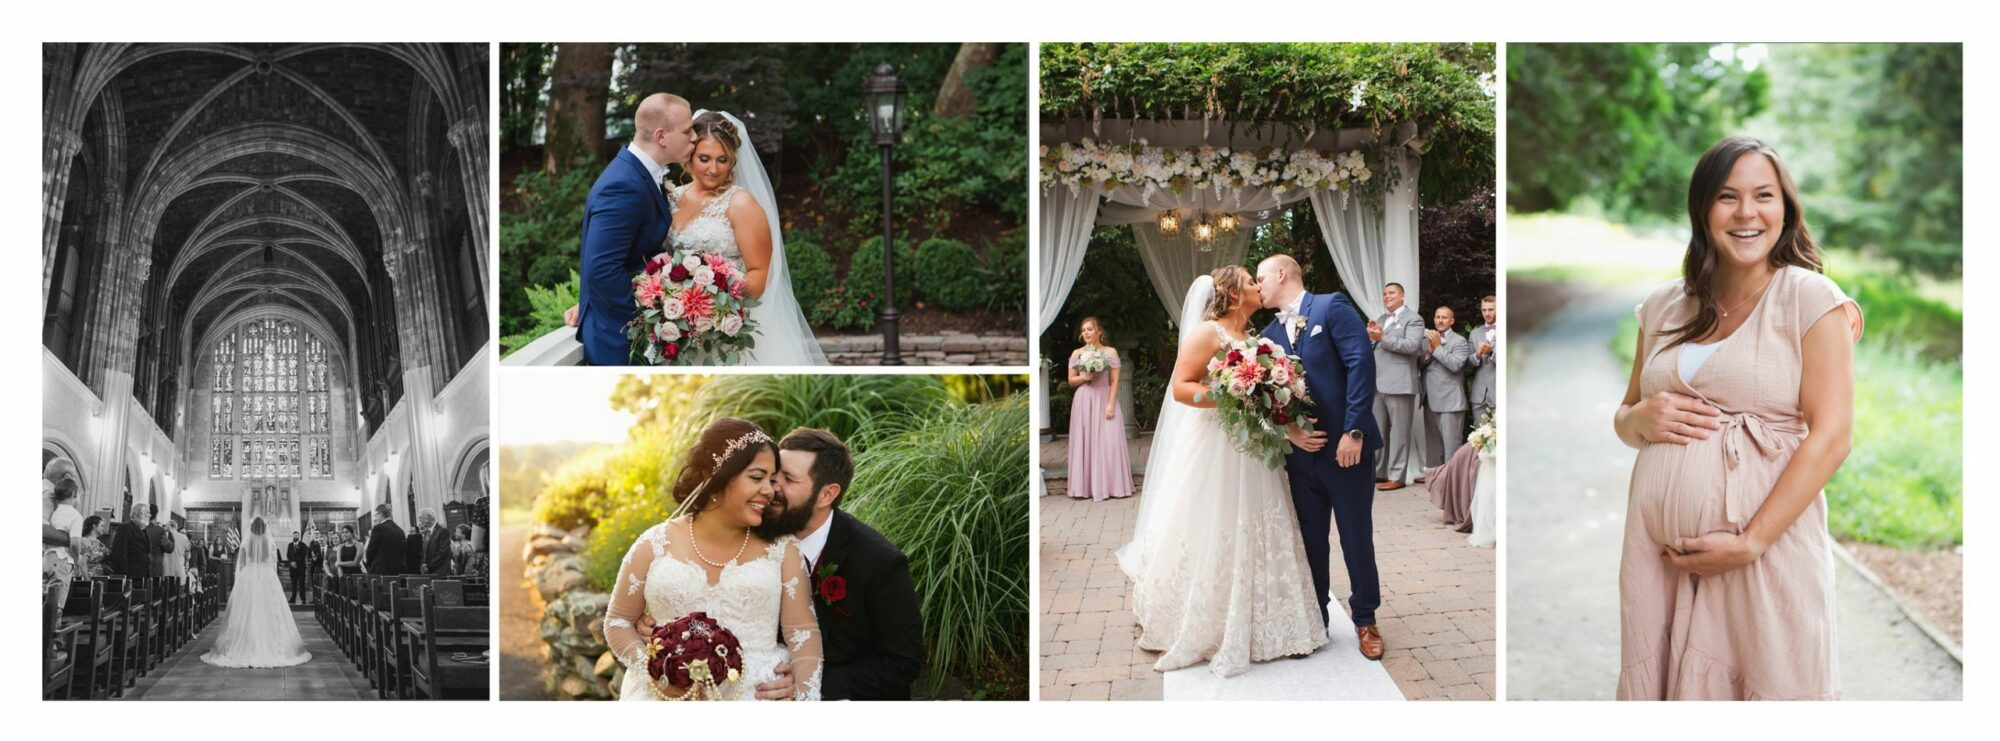 582-Frost Photography wedding photographer NJ